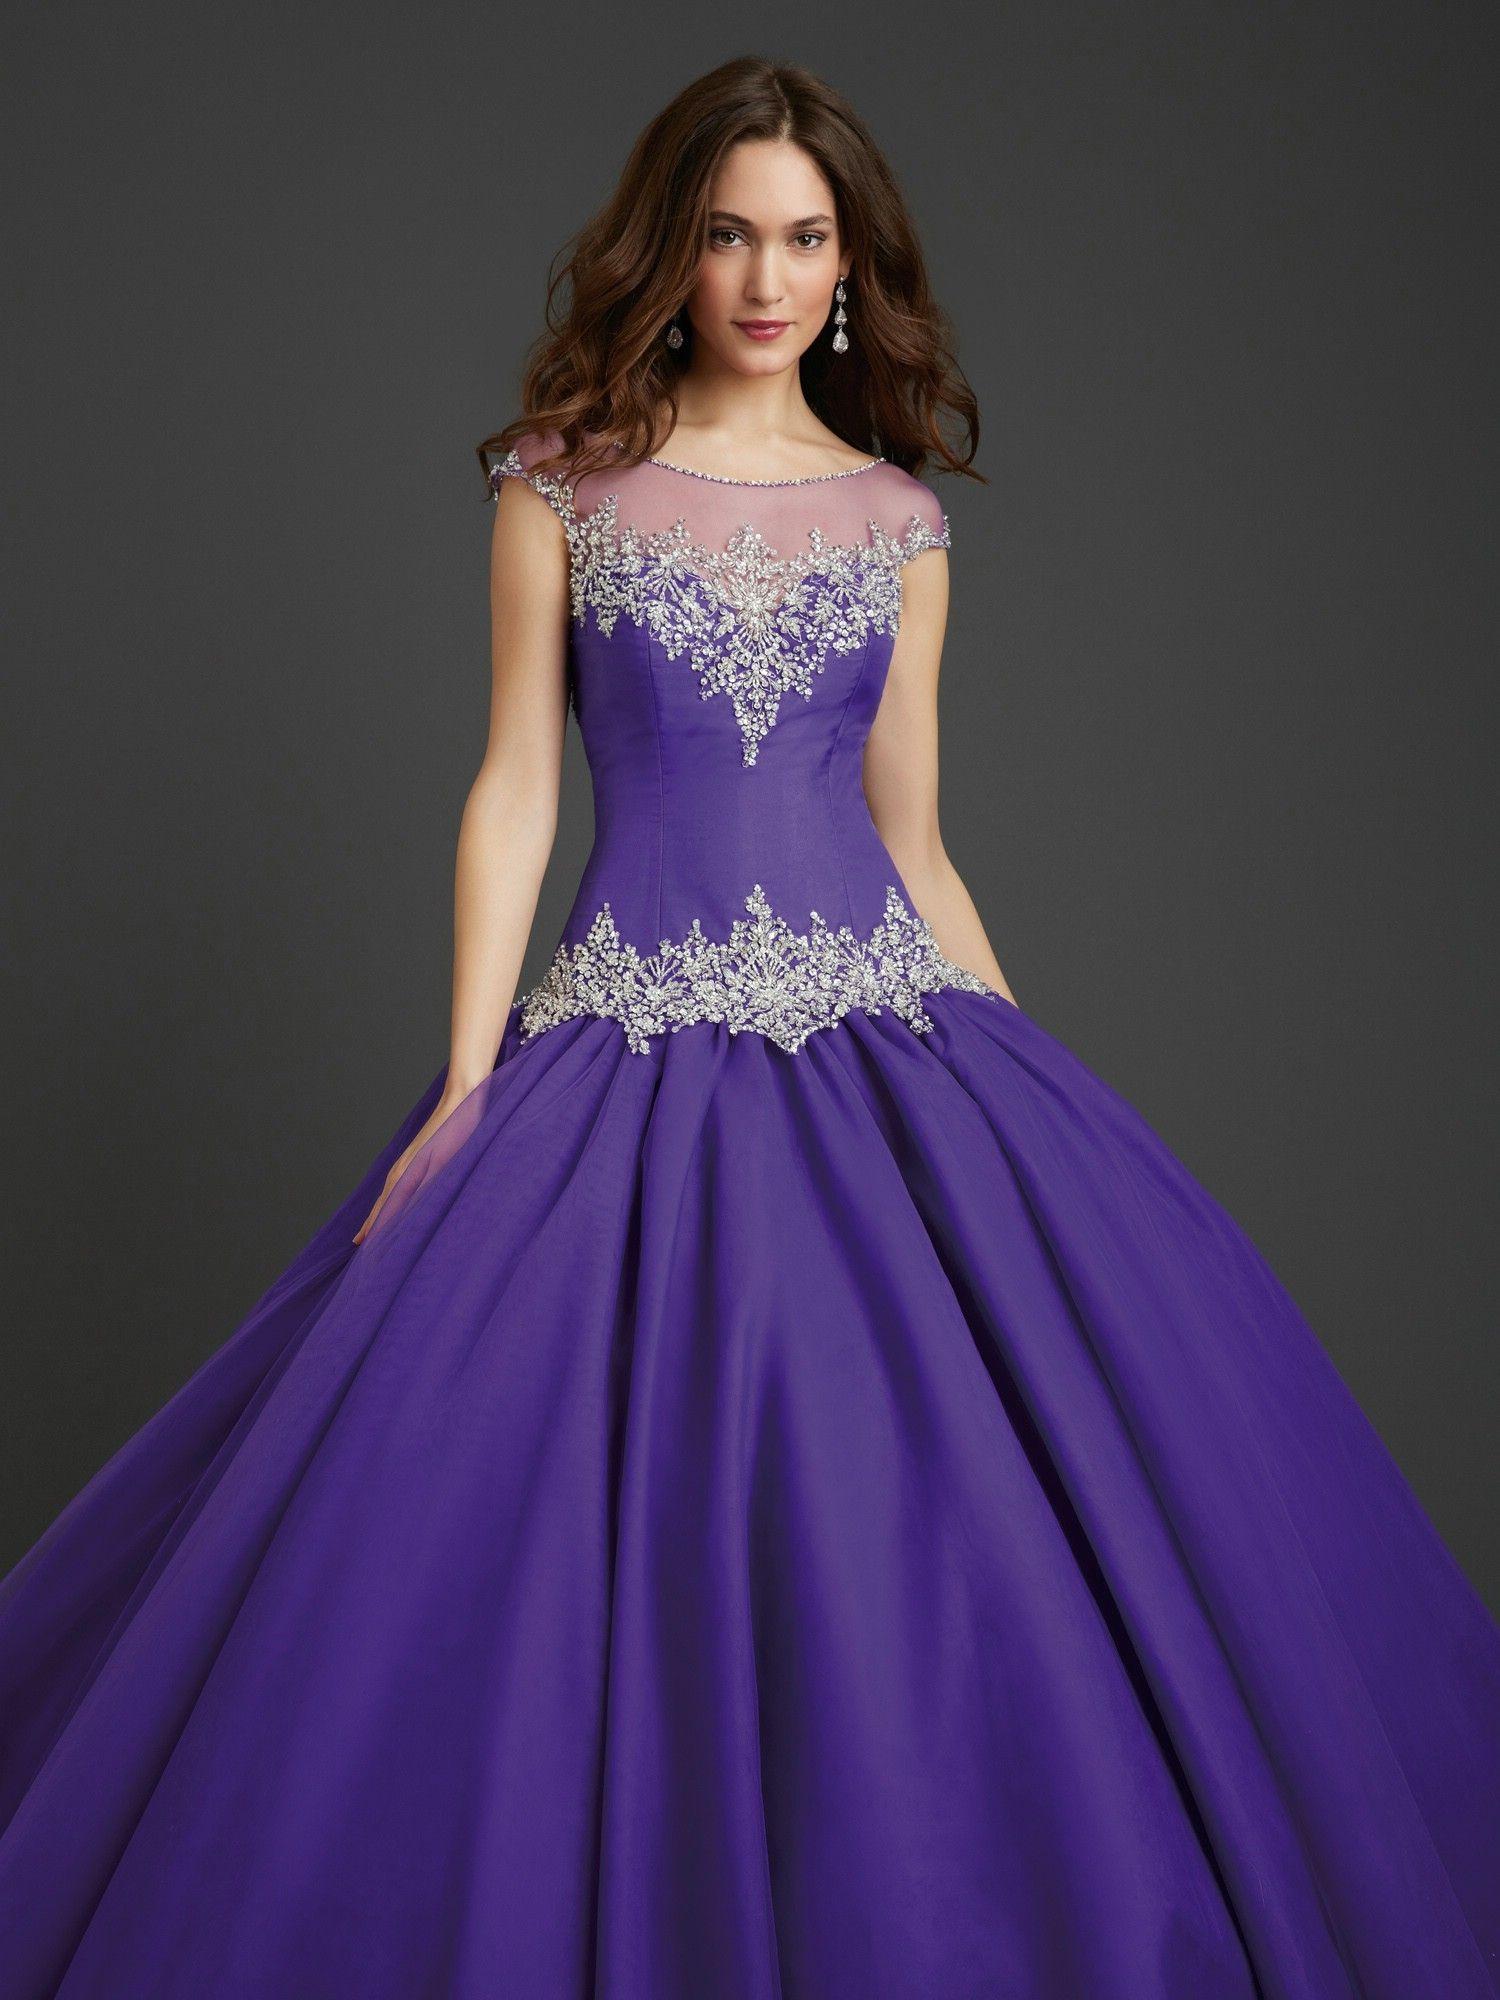 Allure Quinceanera Dresses - Style Q360 [Q360] - $658.00 : Wedding Dresses, Bridesmaid Dresses, Prom Dresses and Bridal Dresses - Your Best Bridal Prices